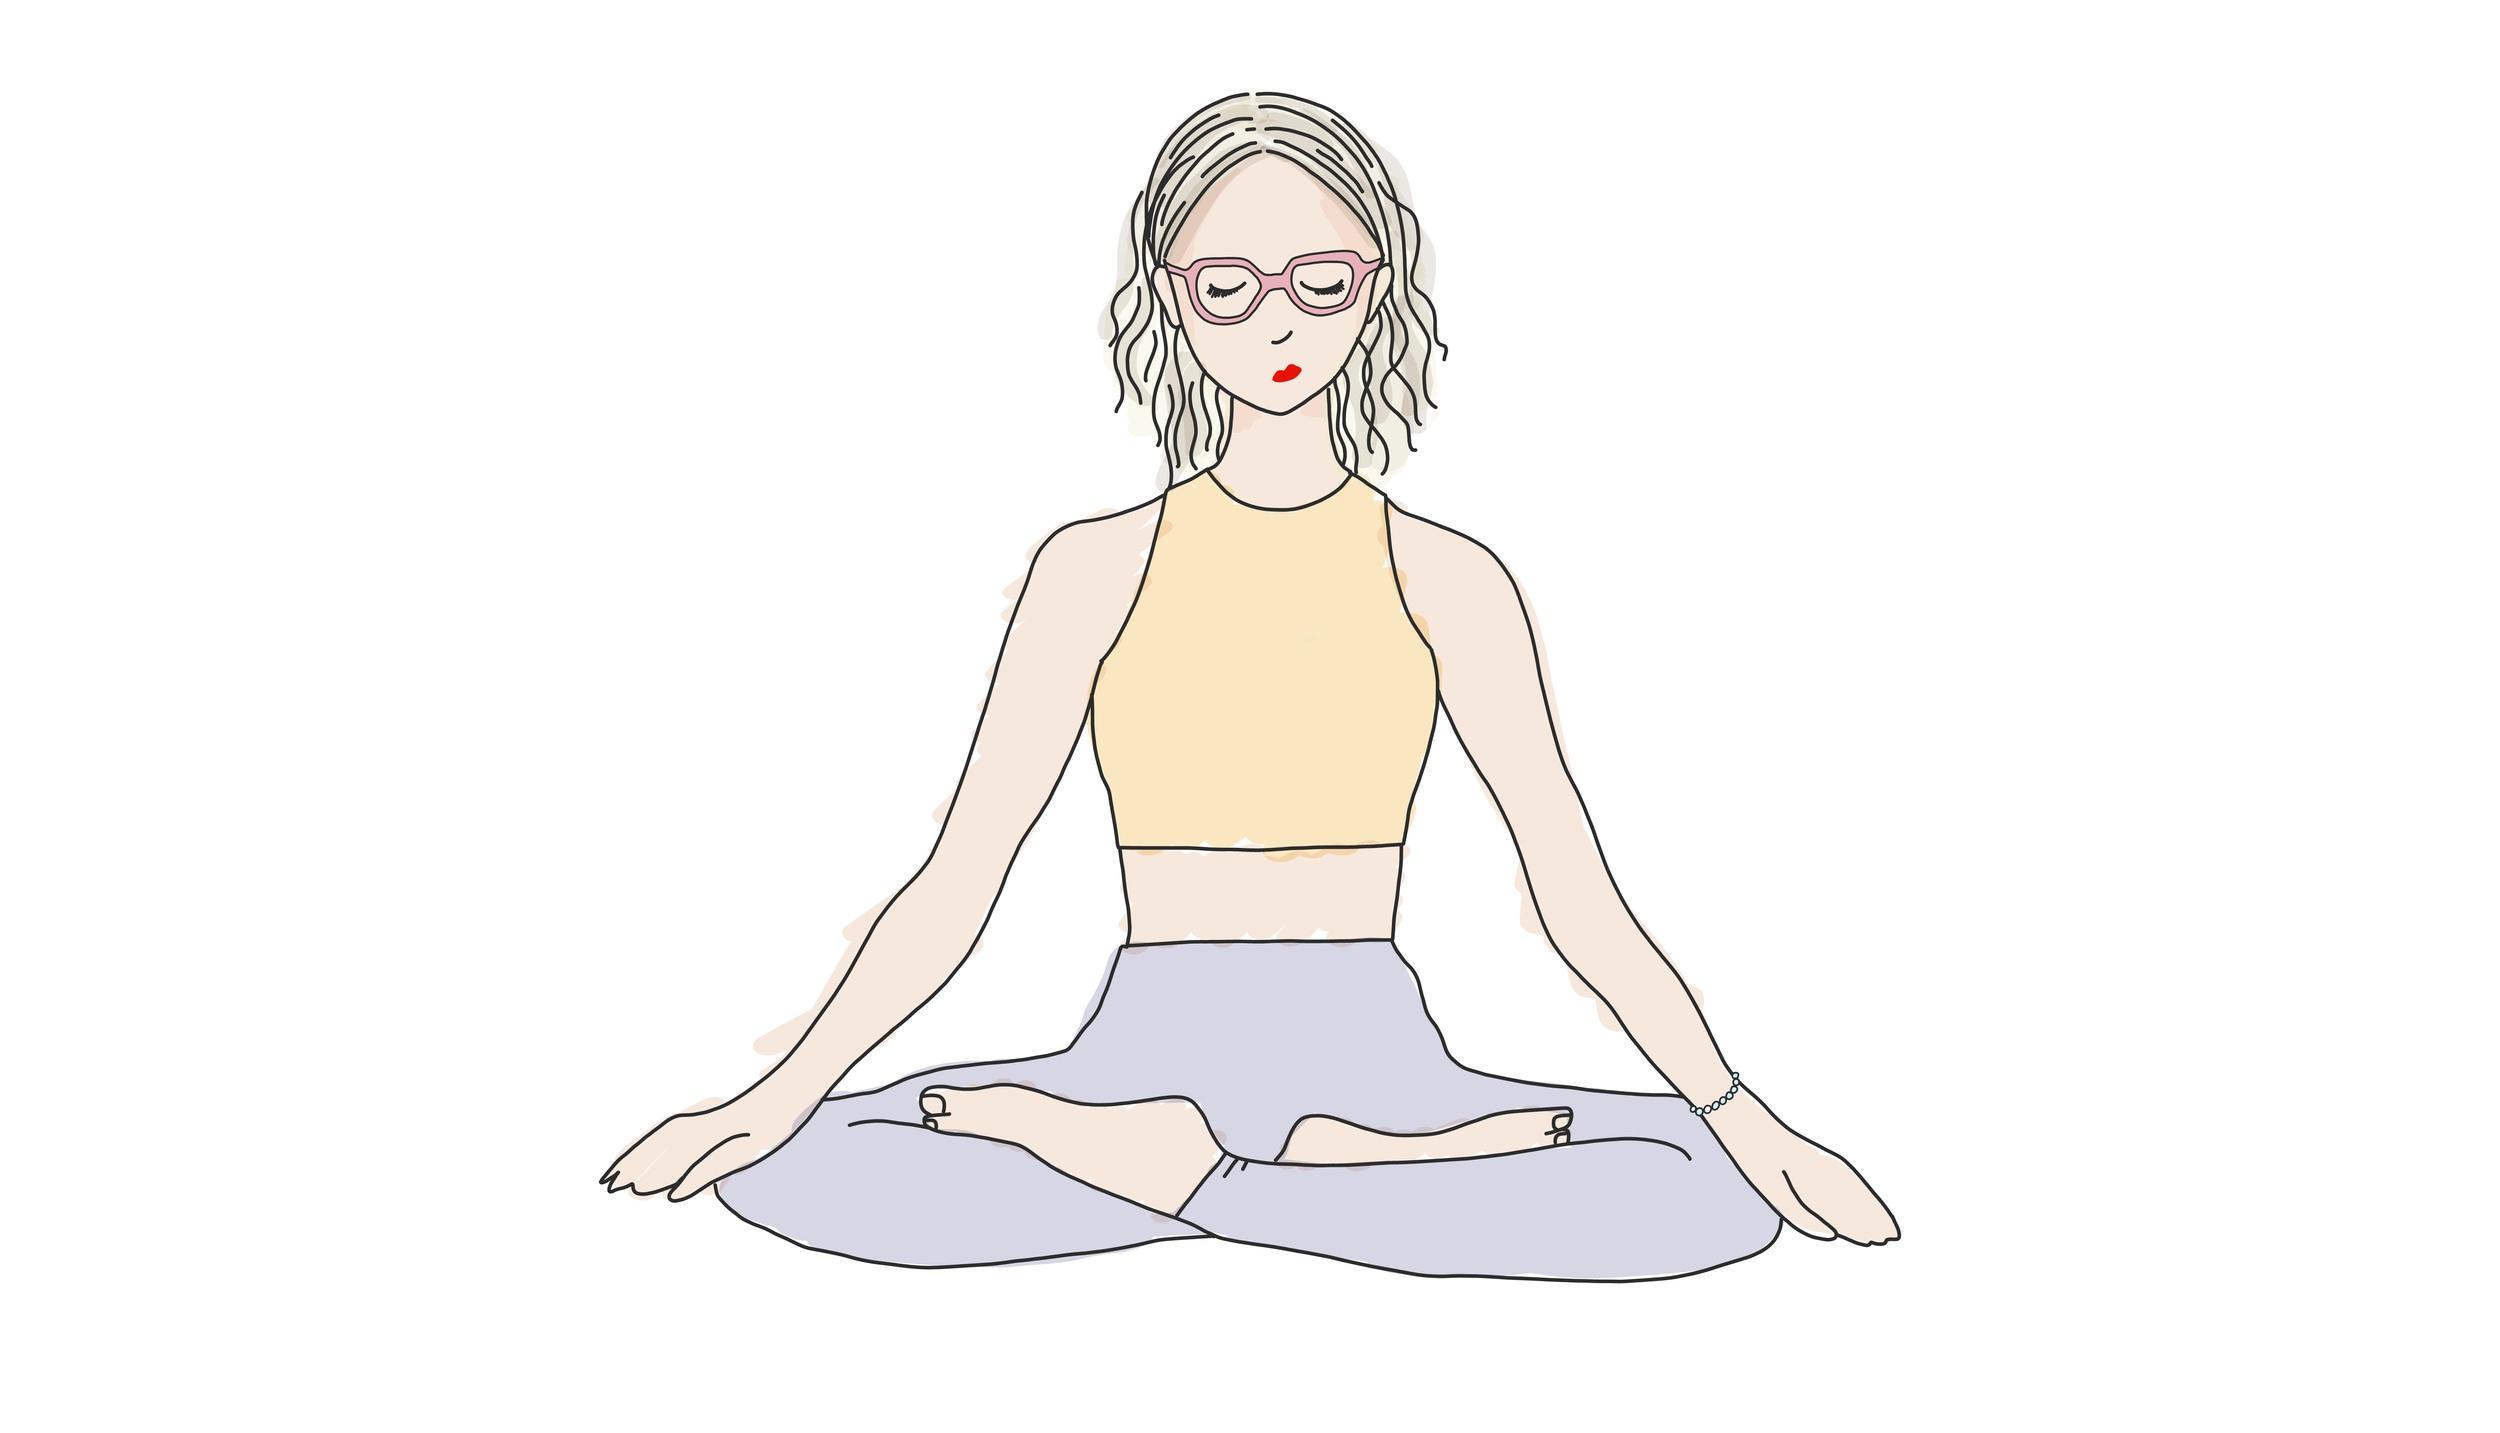 YogaIllustration-02.jpg